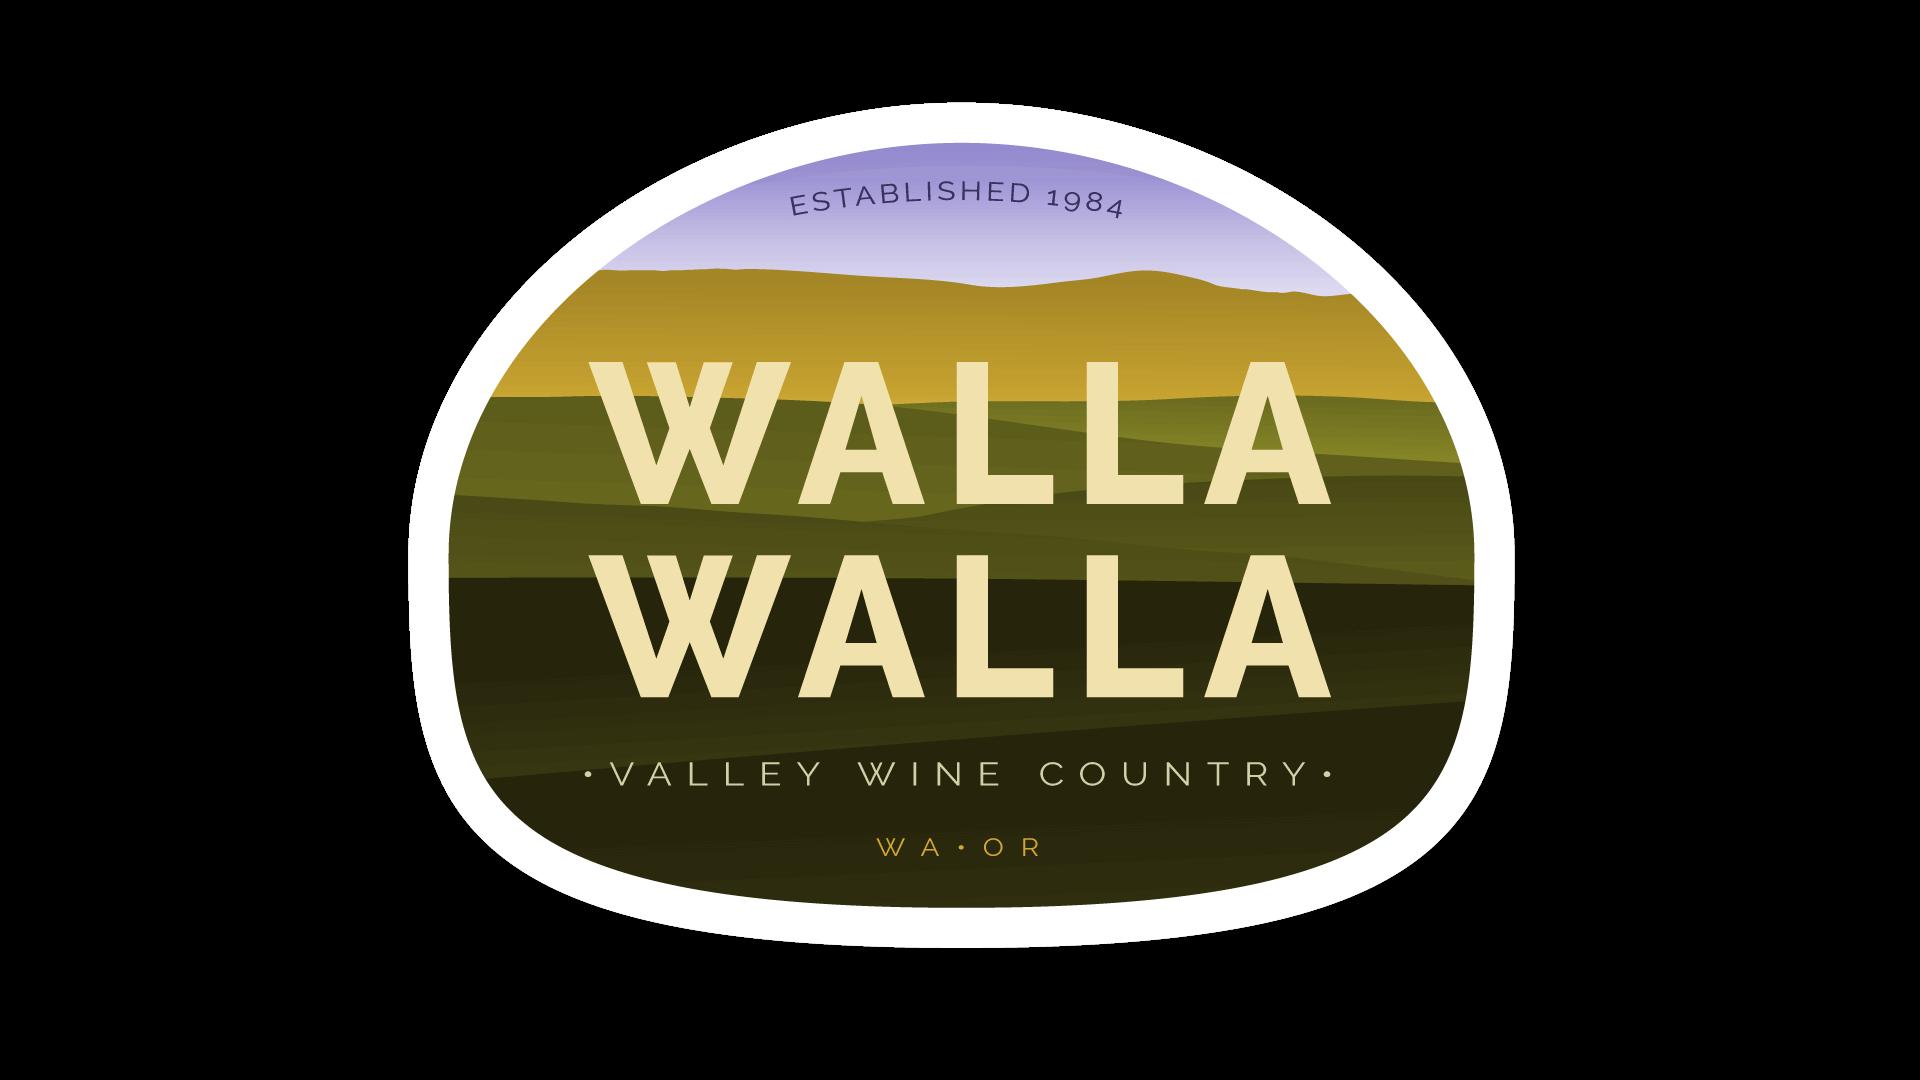 Walla Walla Valley Wine Country Guide Emblem - Wine Folly